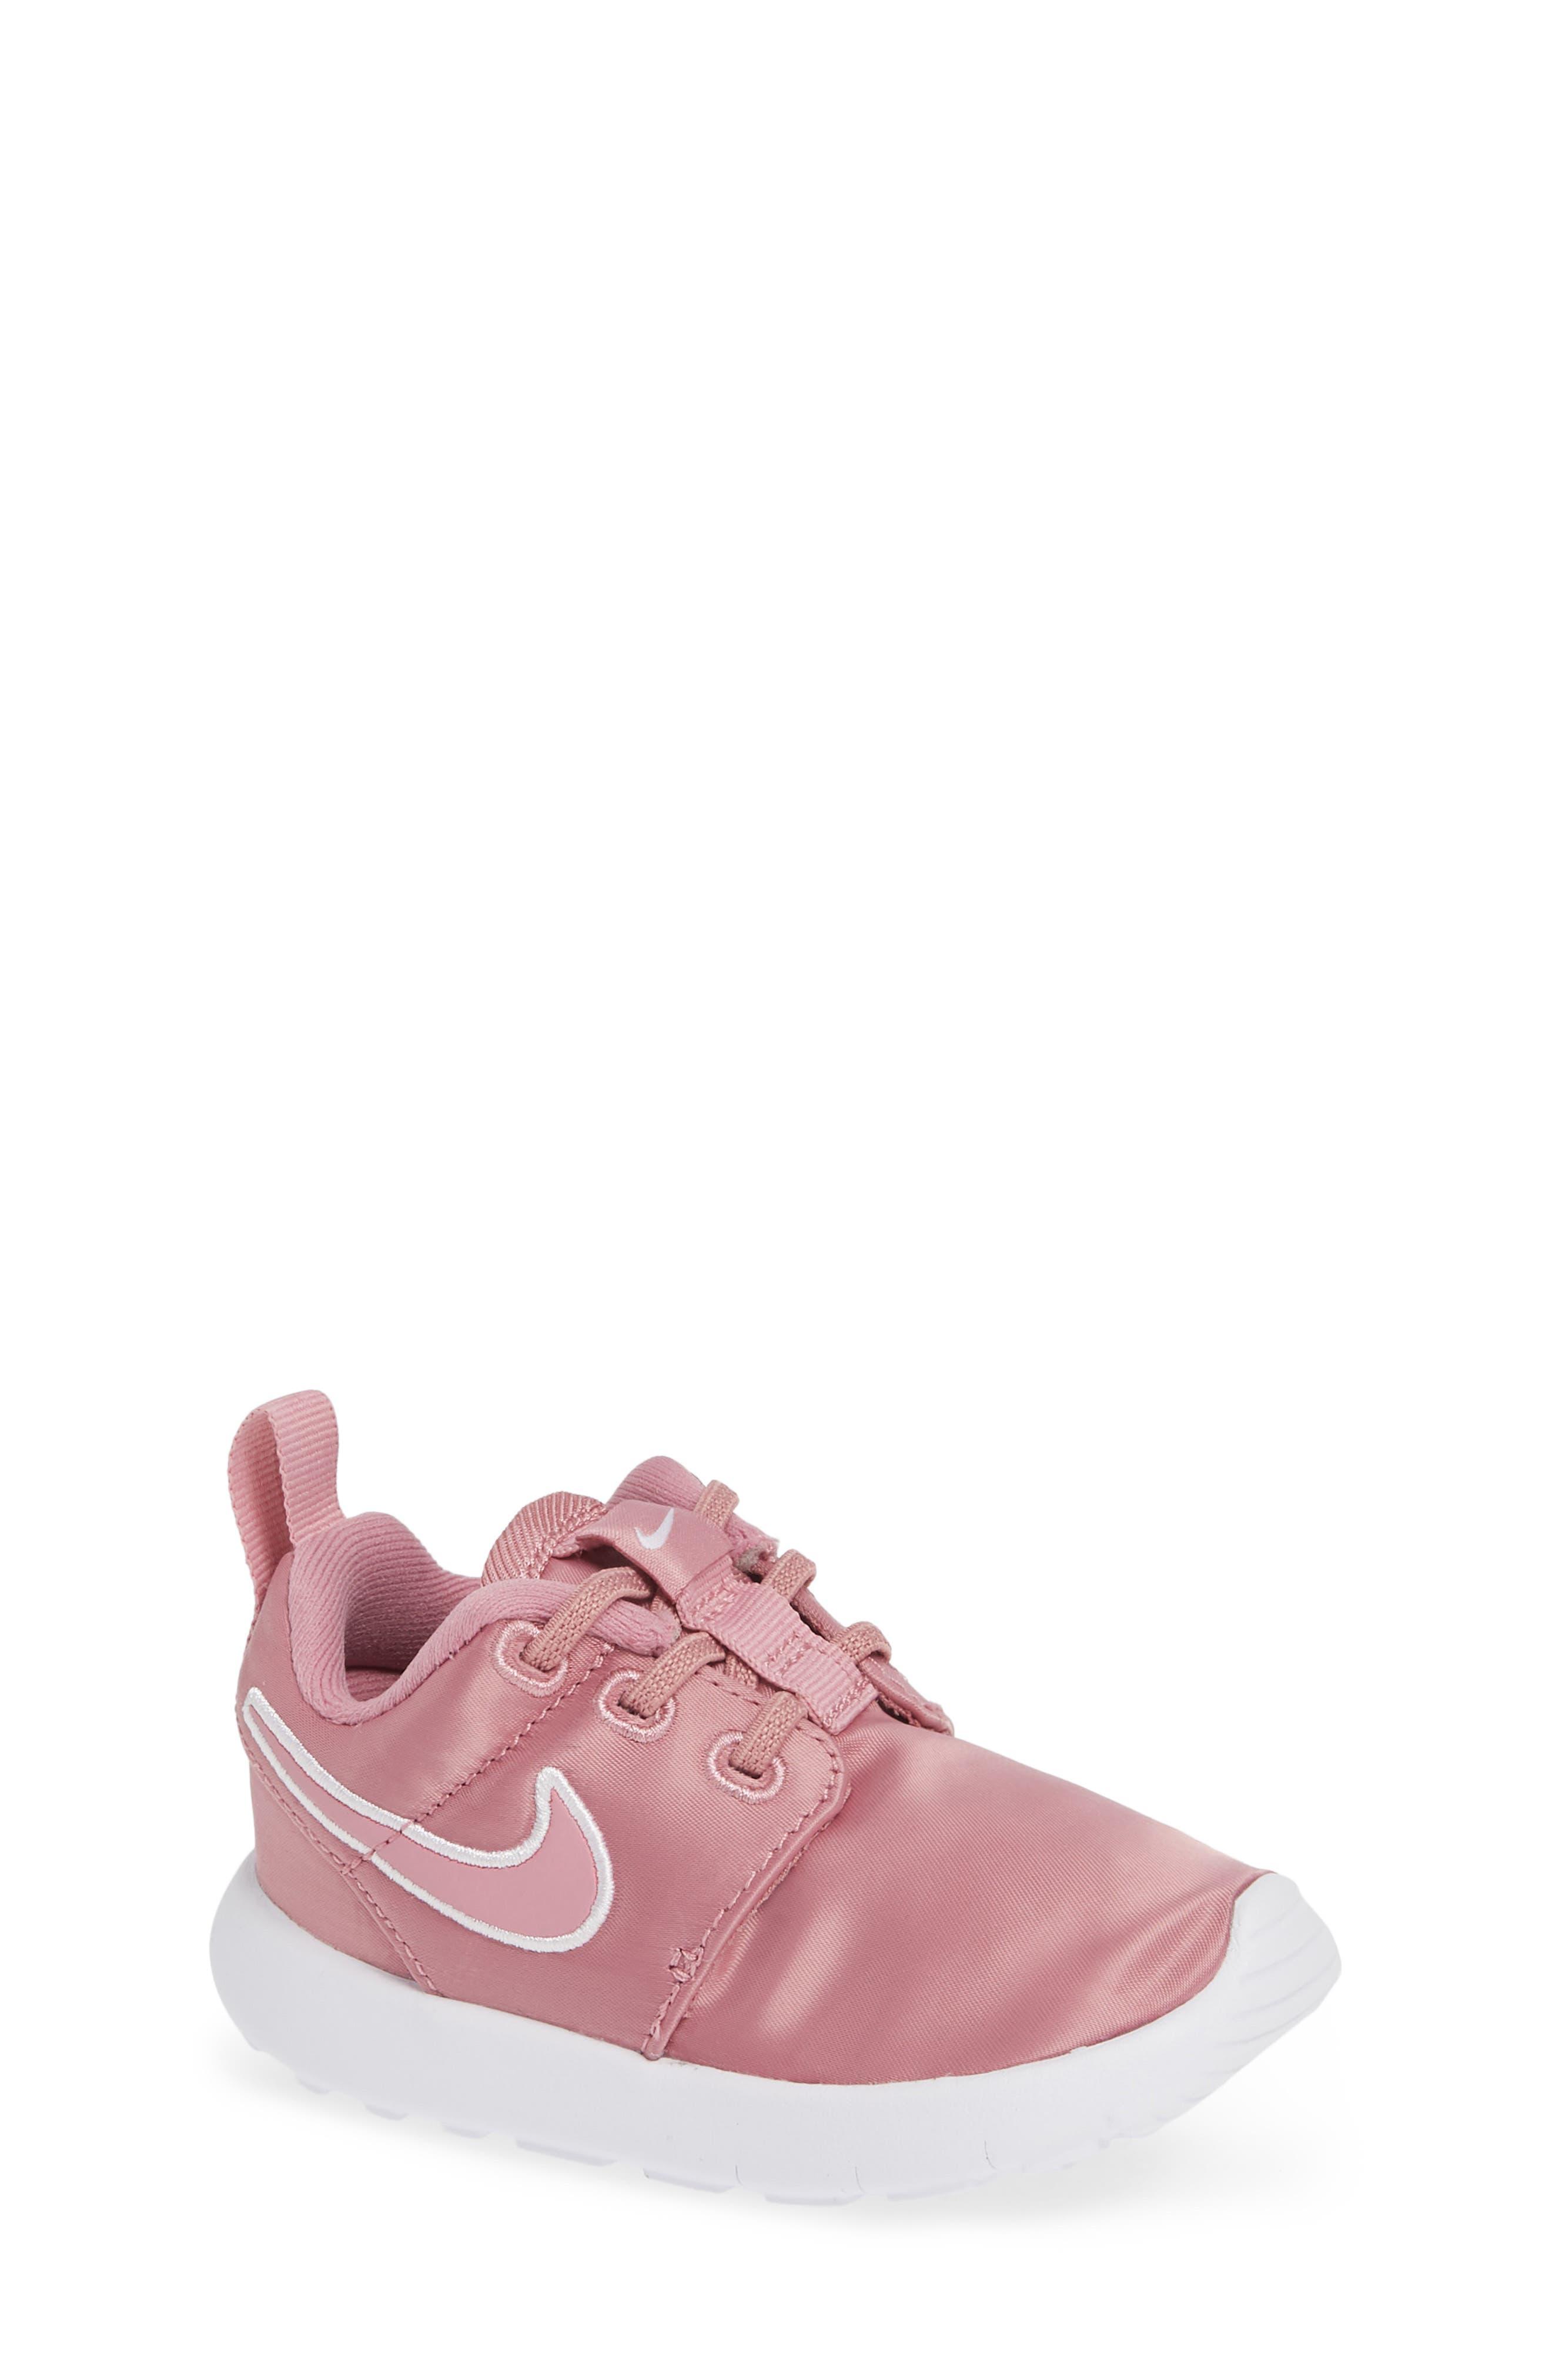 Roshe Run Sneaker,                             Main thumbnail 1, color,                             ELEMENTAL PINK/ PINK-WHITE